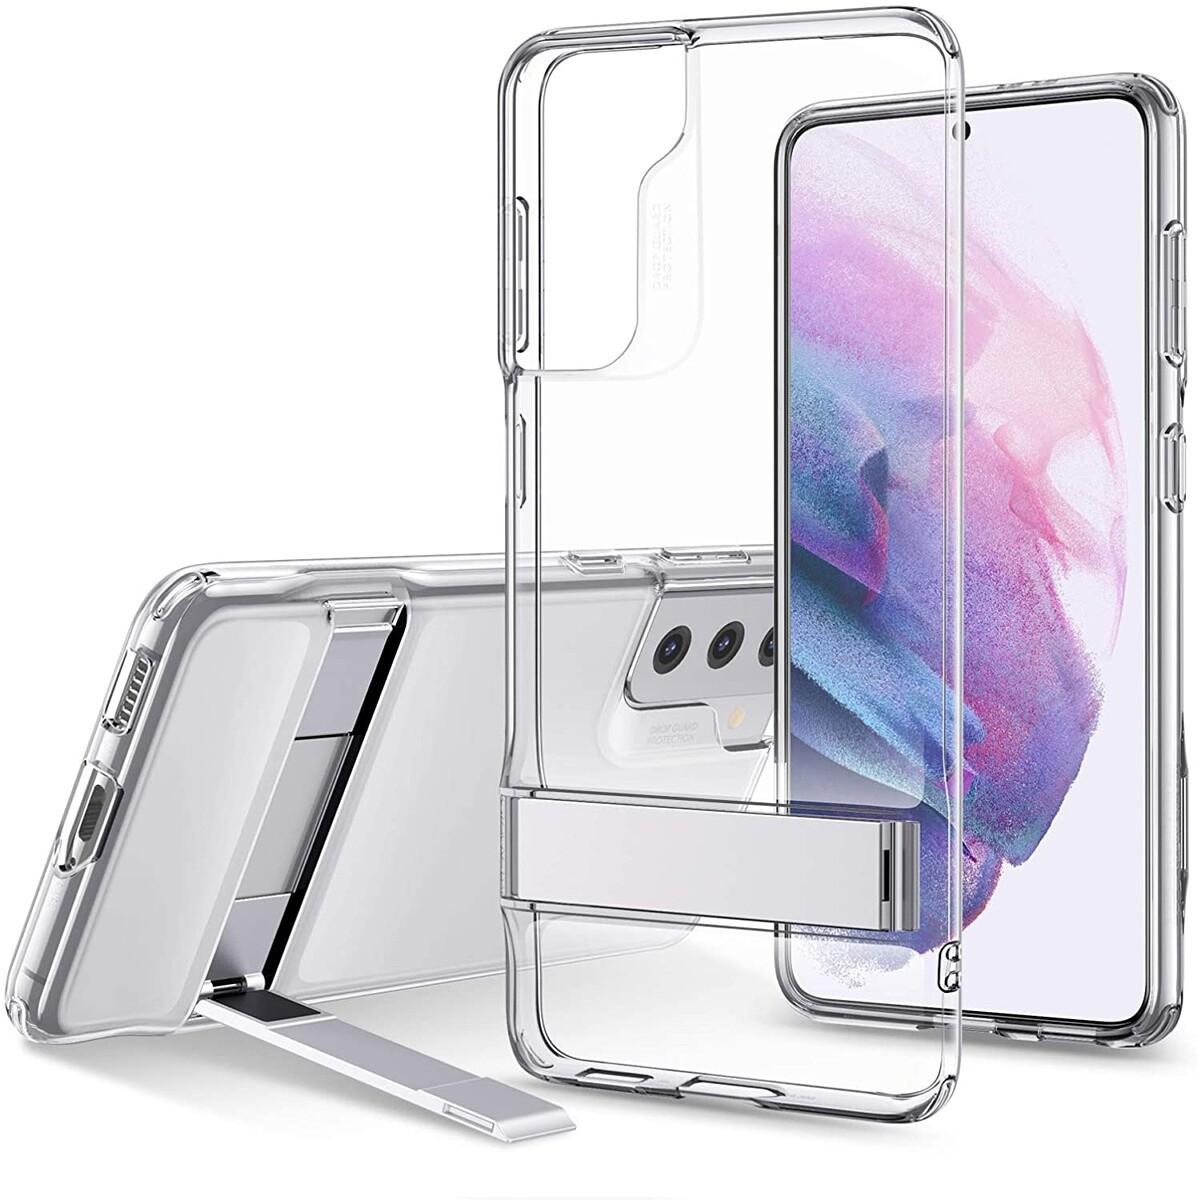 ESR Metal Kickstand Case for Galaxy S21 Plus